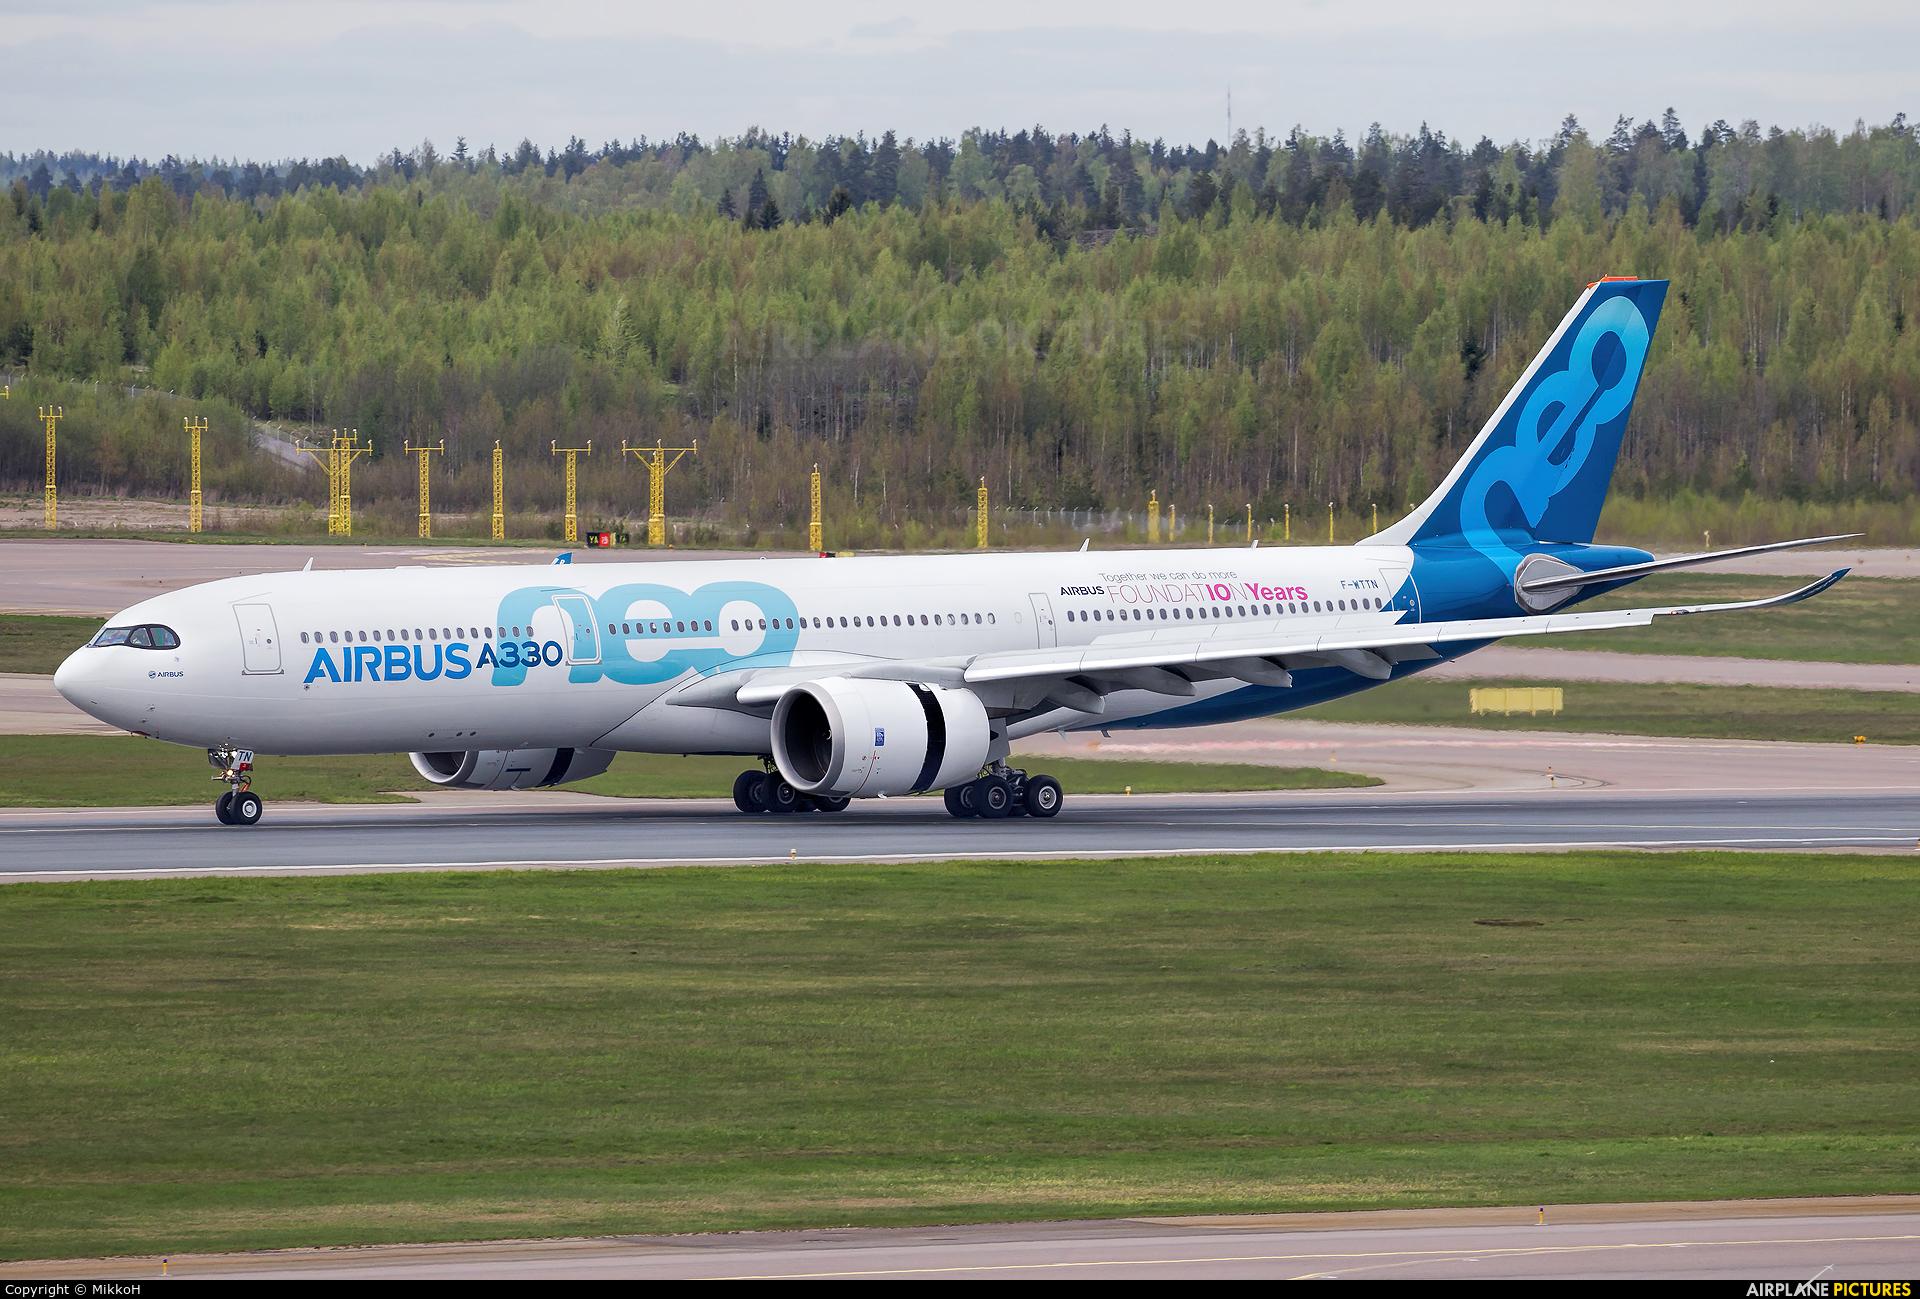 Airbus Industrie F-WTTN aircraft at Helsinki - Vantaa